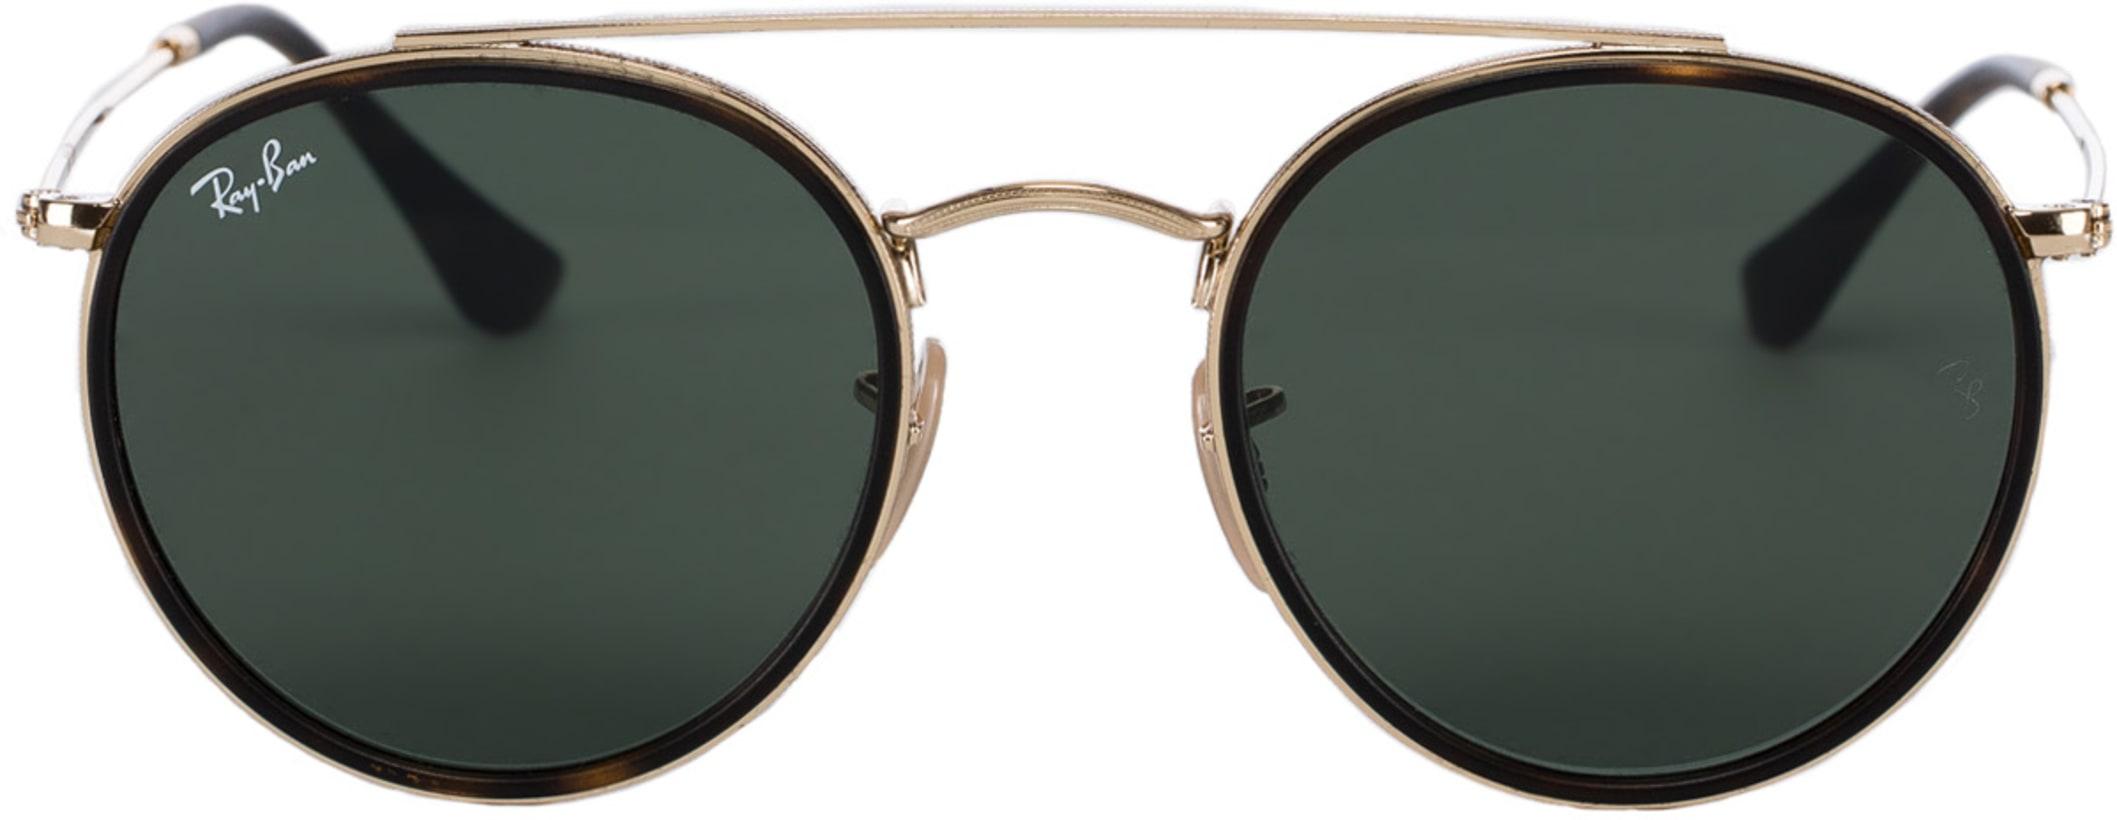 7261ddeae71 Ray-Ban  Round Double Bridge Sunglasses - Gold Green Classic G-15 ...